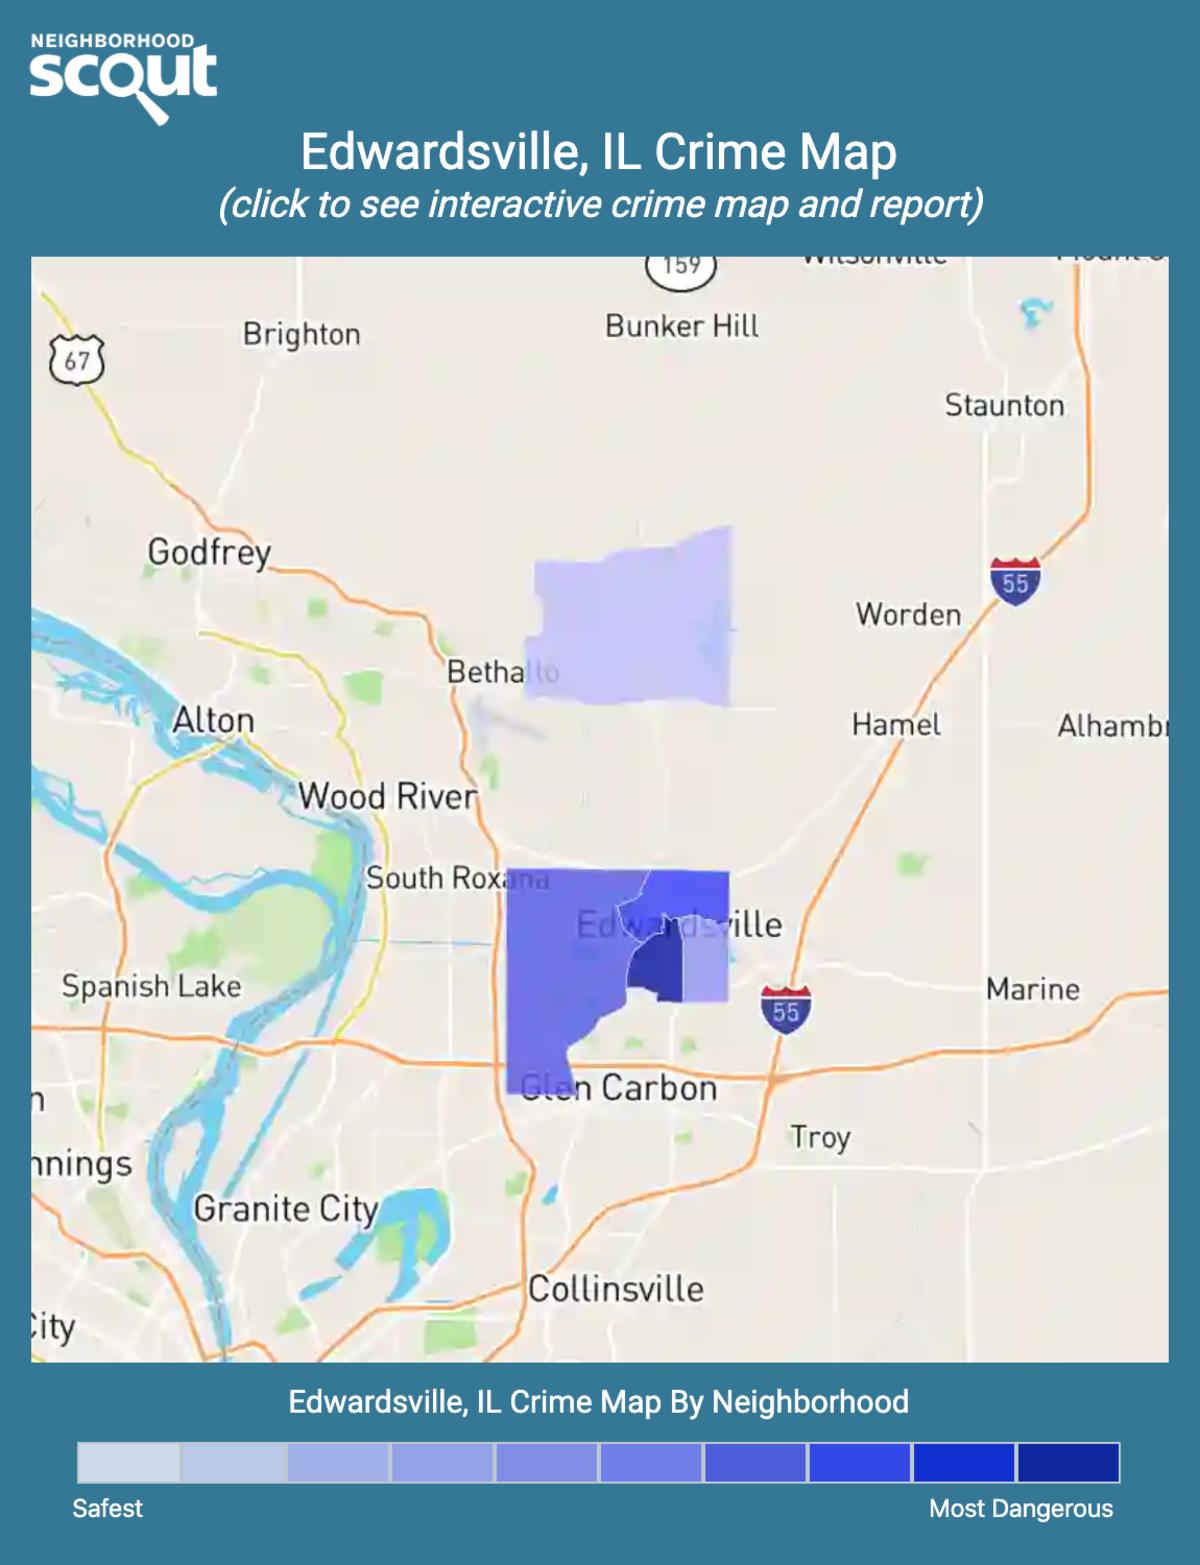 Edwardsville, Illinois crime map